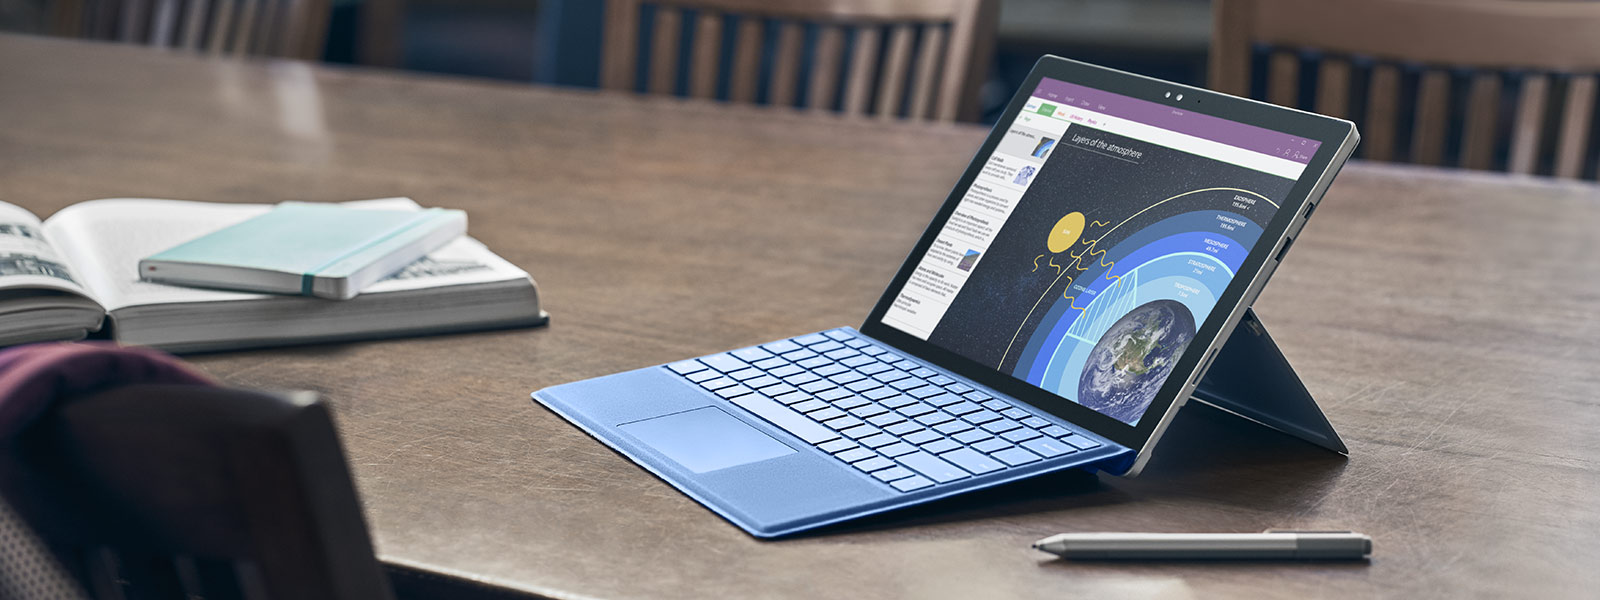 Surface Studio i Studio-tilstand med Surface Pen og mus.